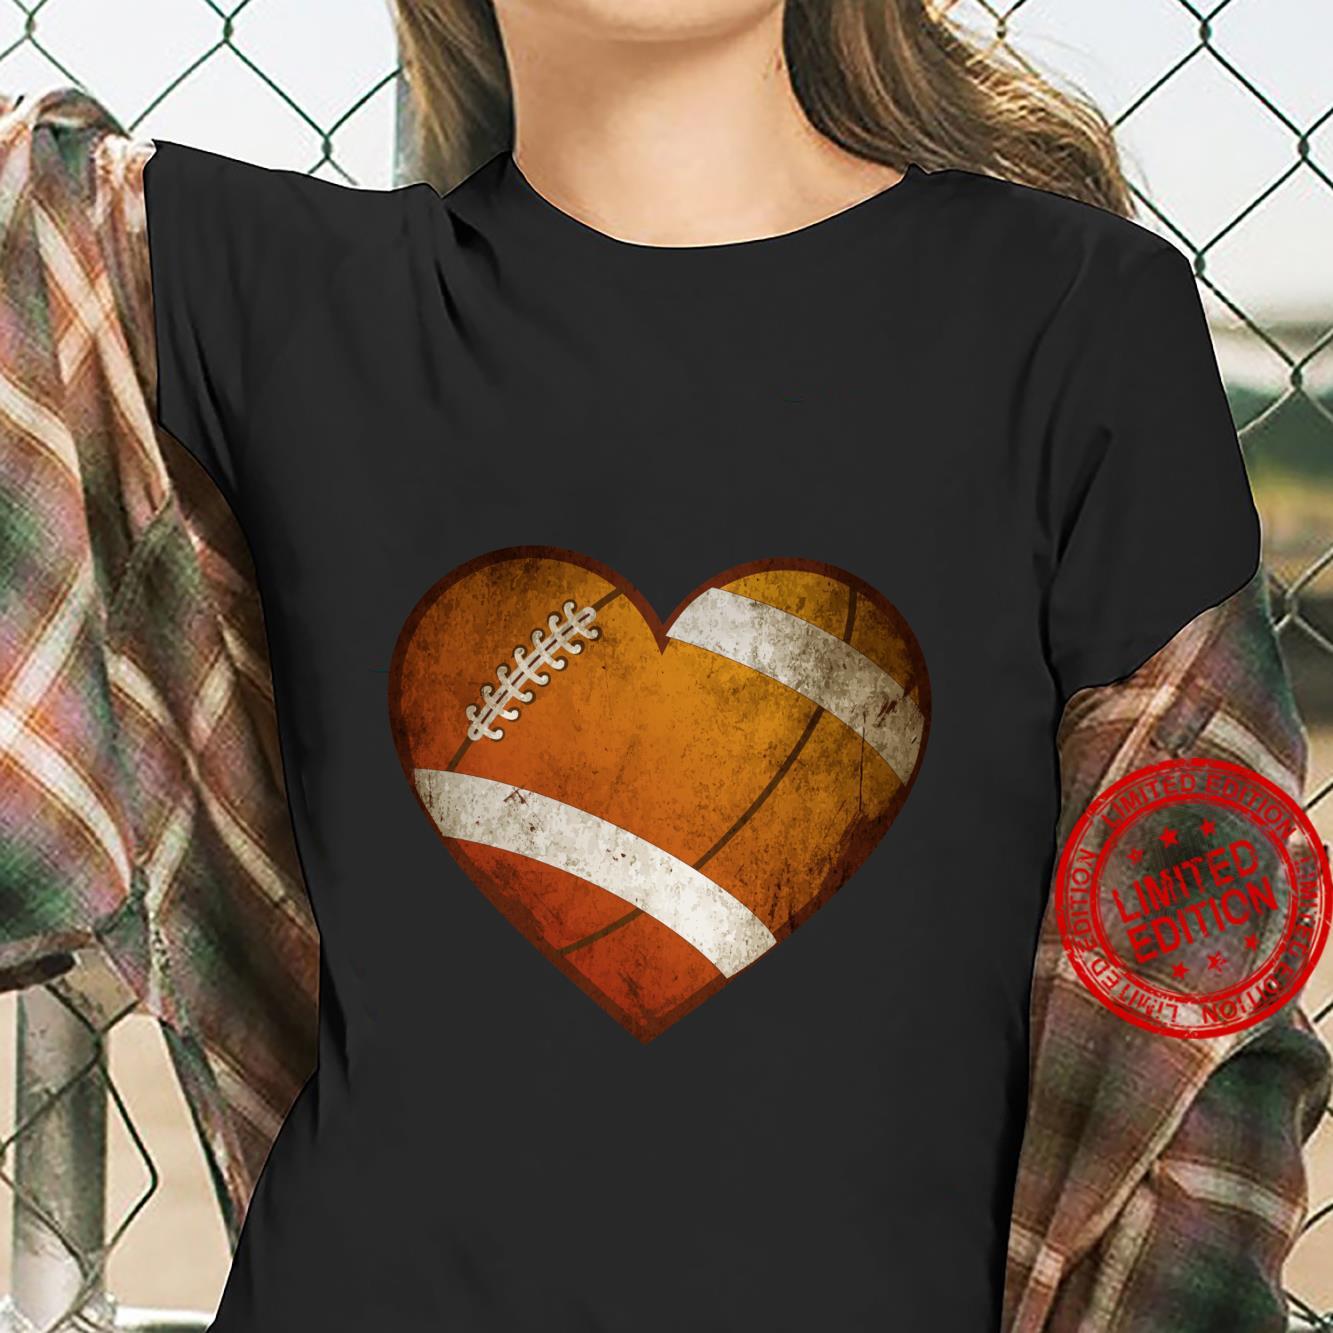 Fußball Geschenke Männer Frauen Ich liebe Fußball Herz Ball Langarmshirt Shirt ladies tee